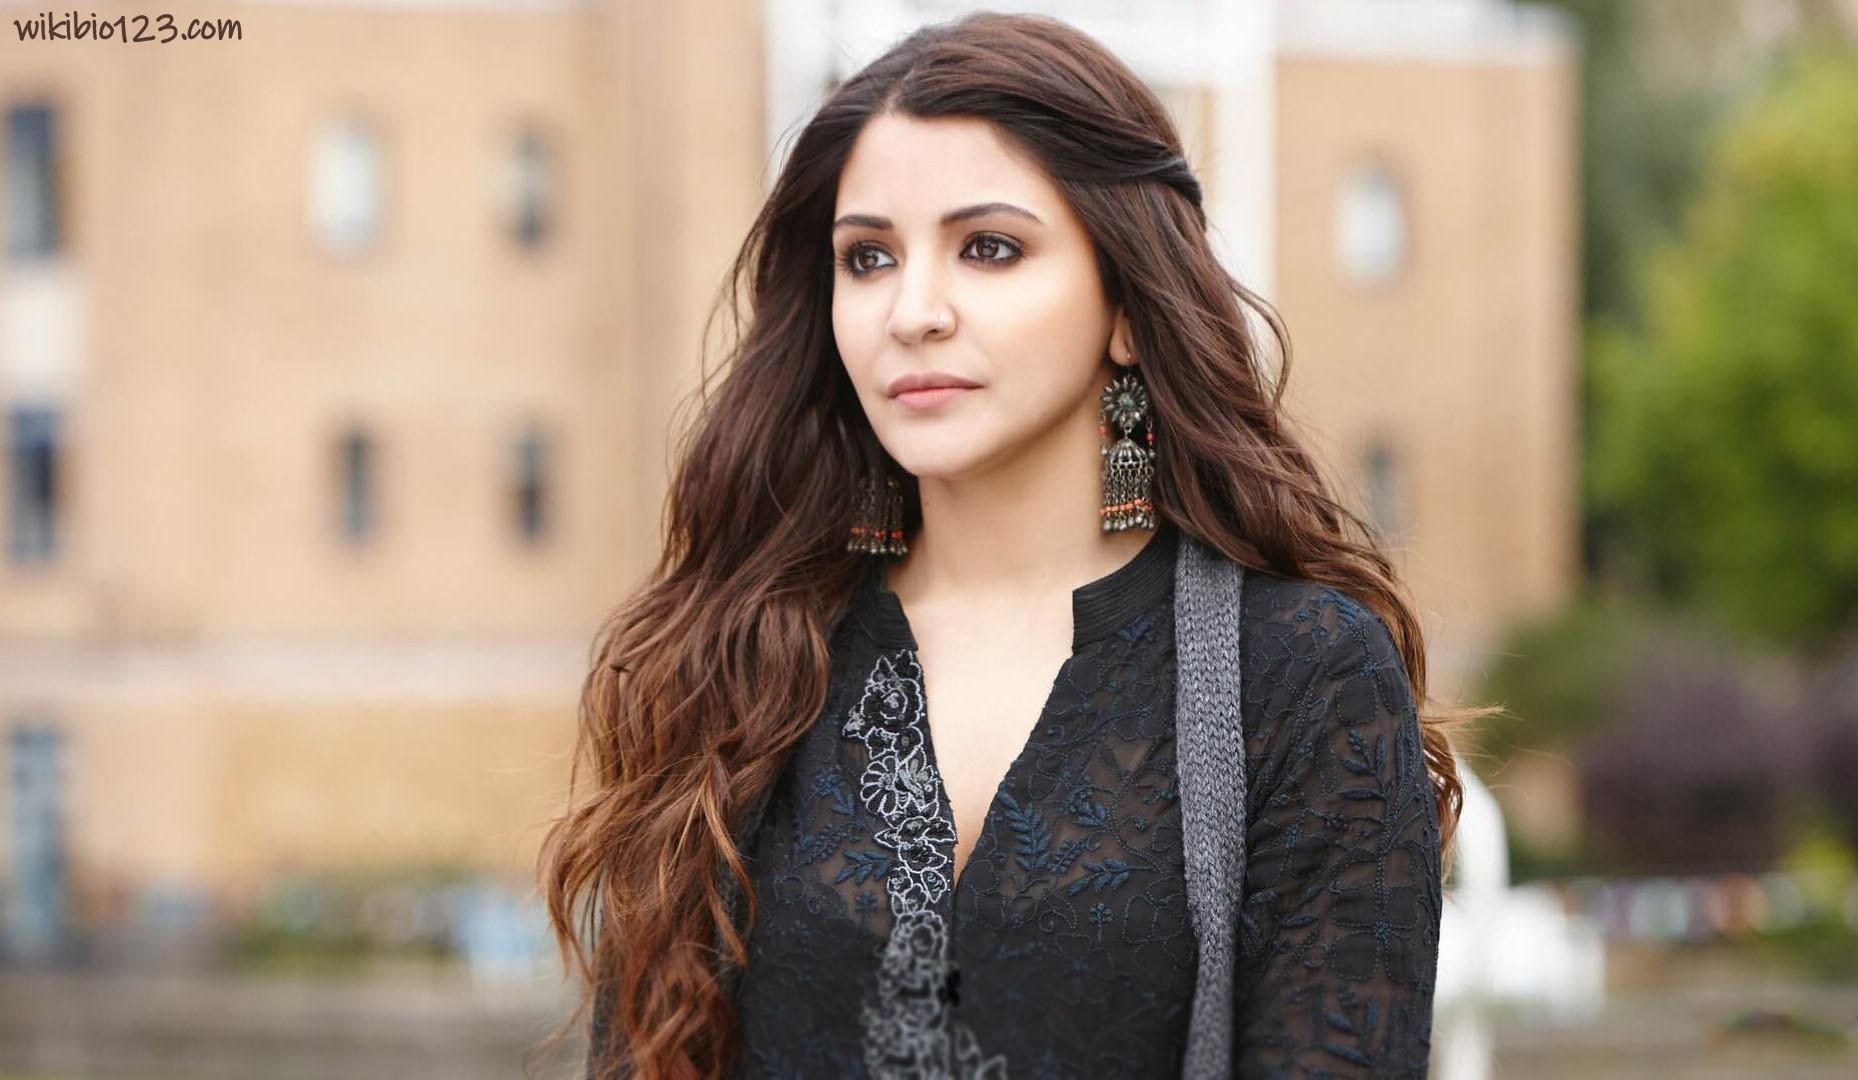 Anushka Sharma wiki Bio Age Figure size Height HD Images Wallpapers Download